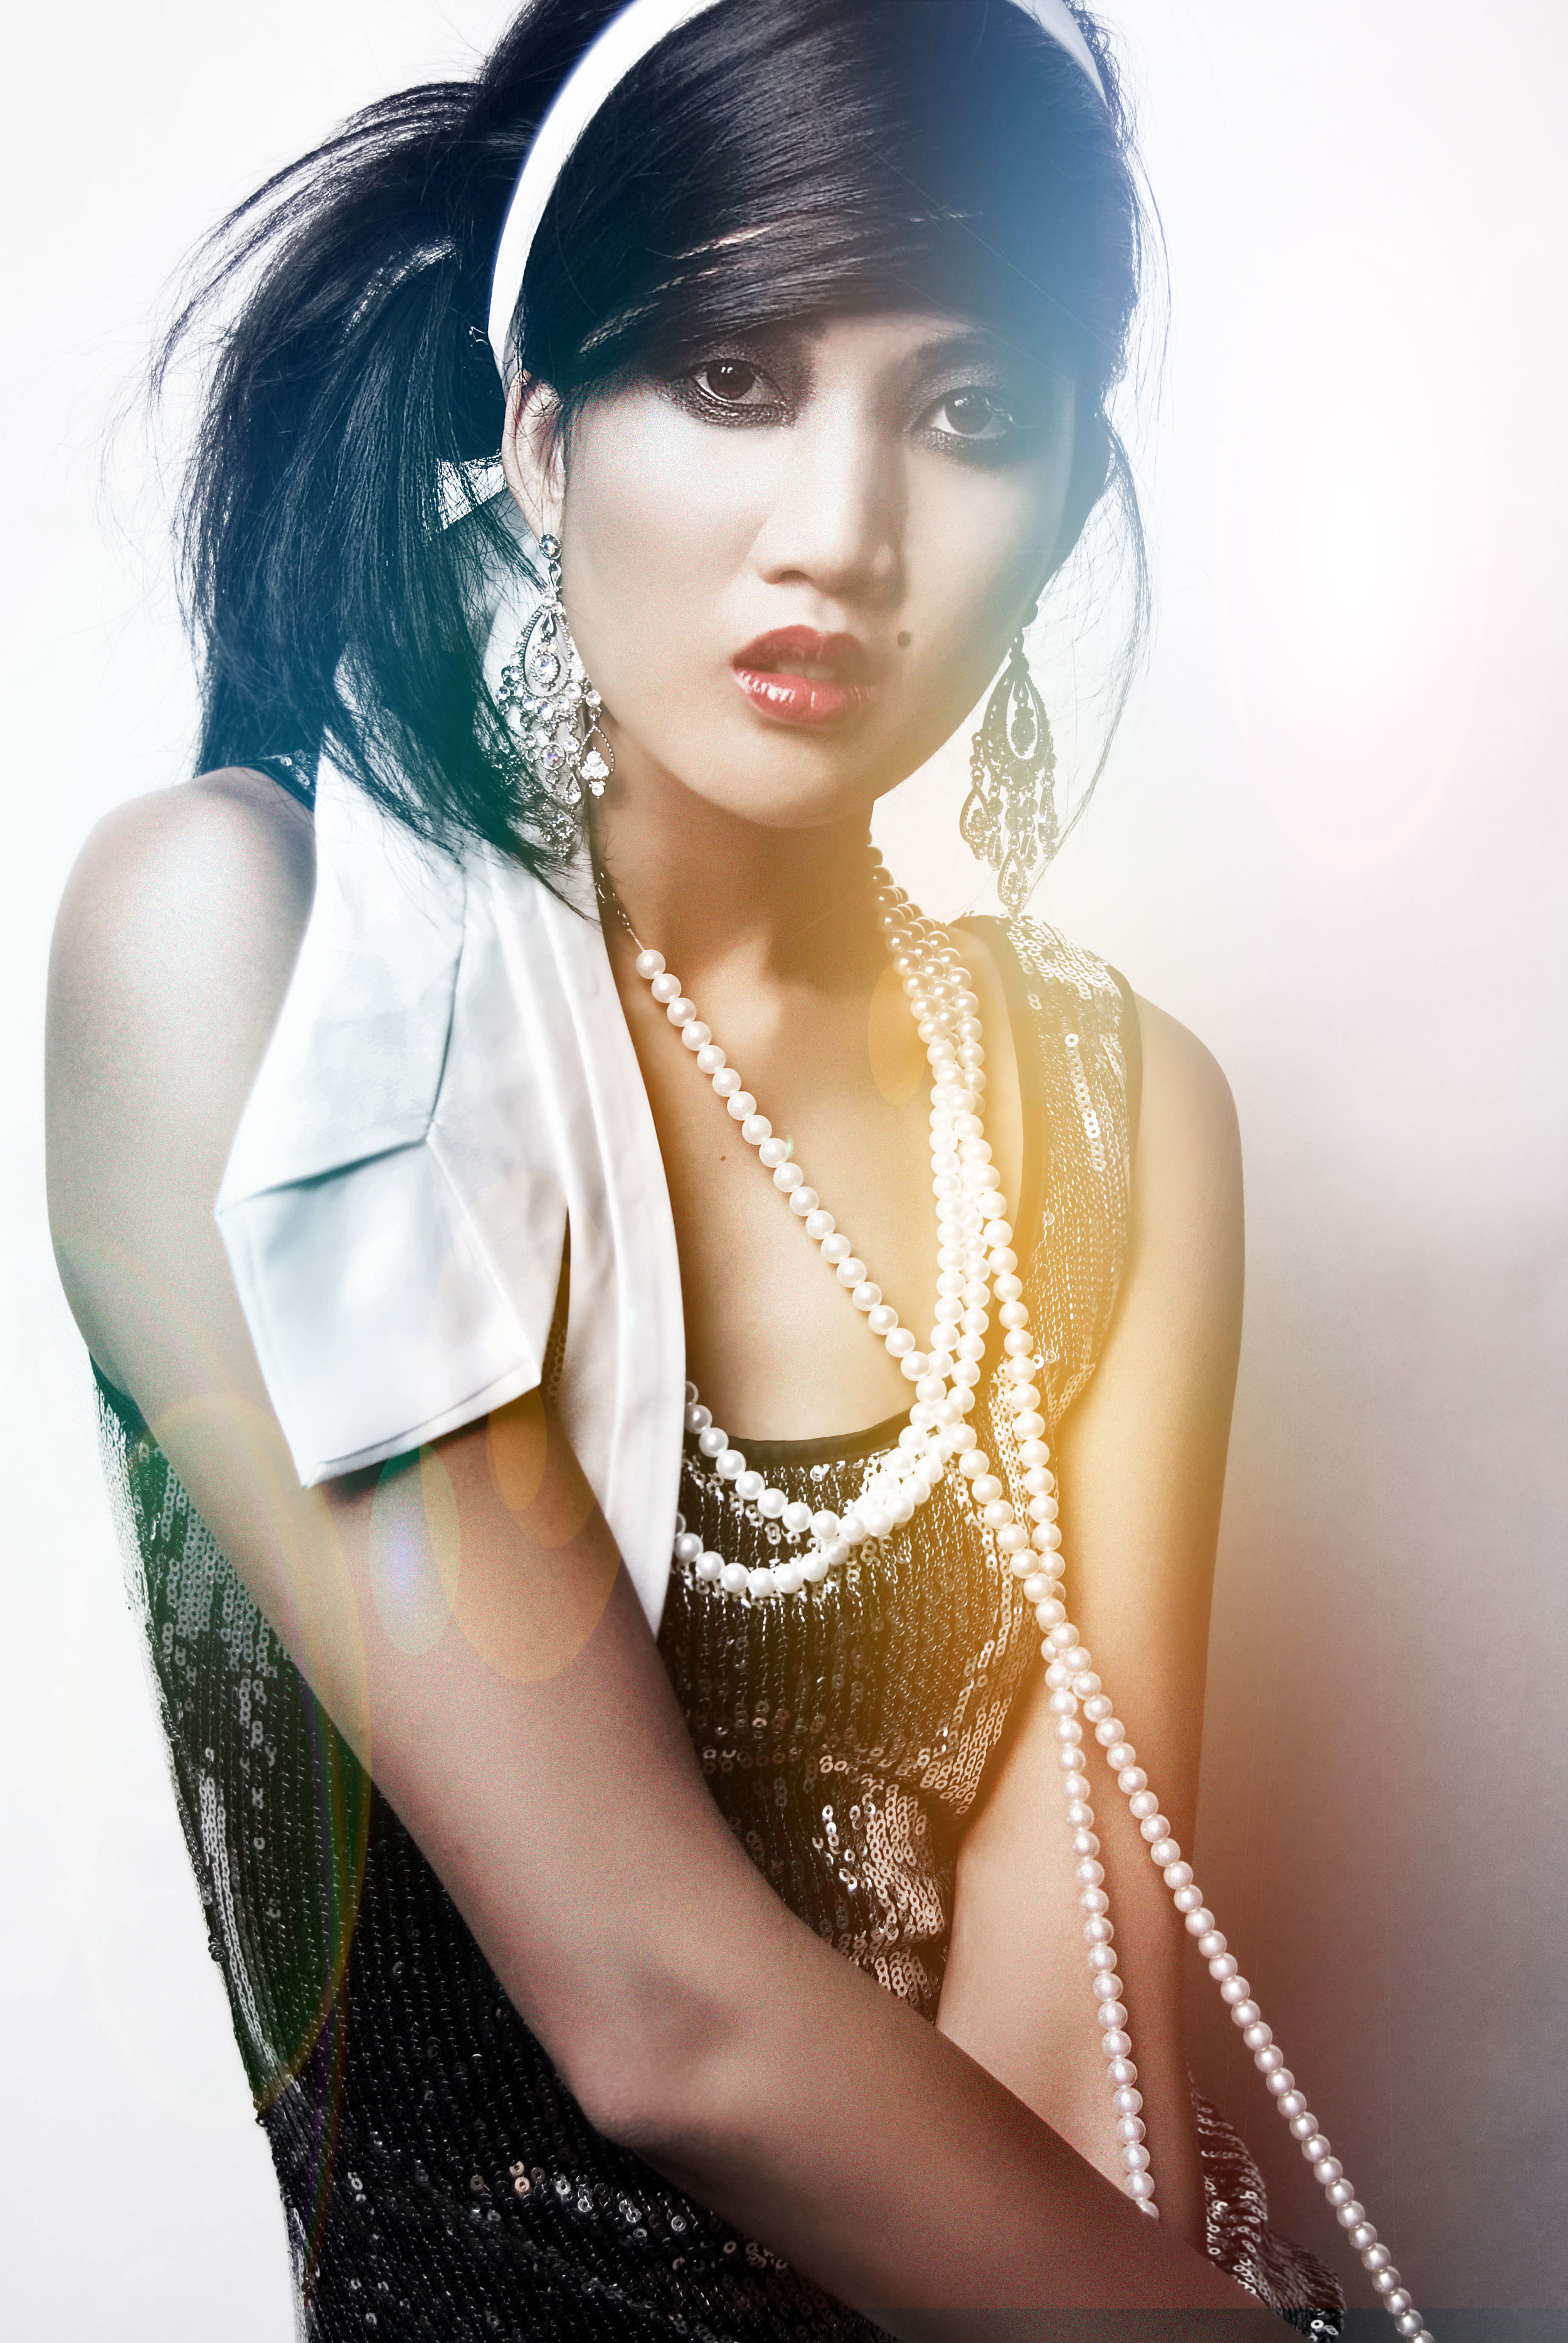 Storm-Pearls-Portfolio-EDIT-Golden-Light.jpg